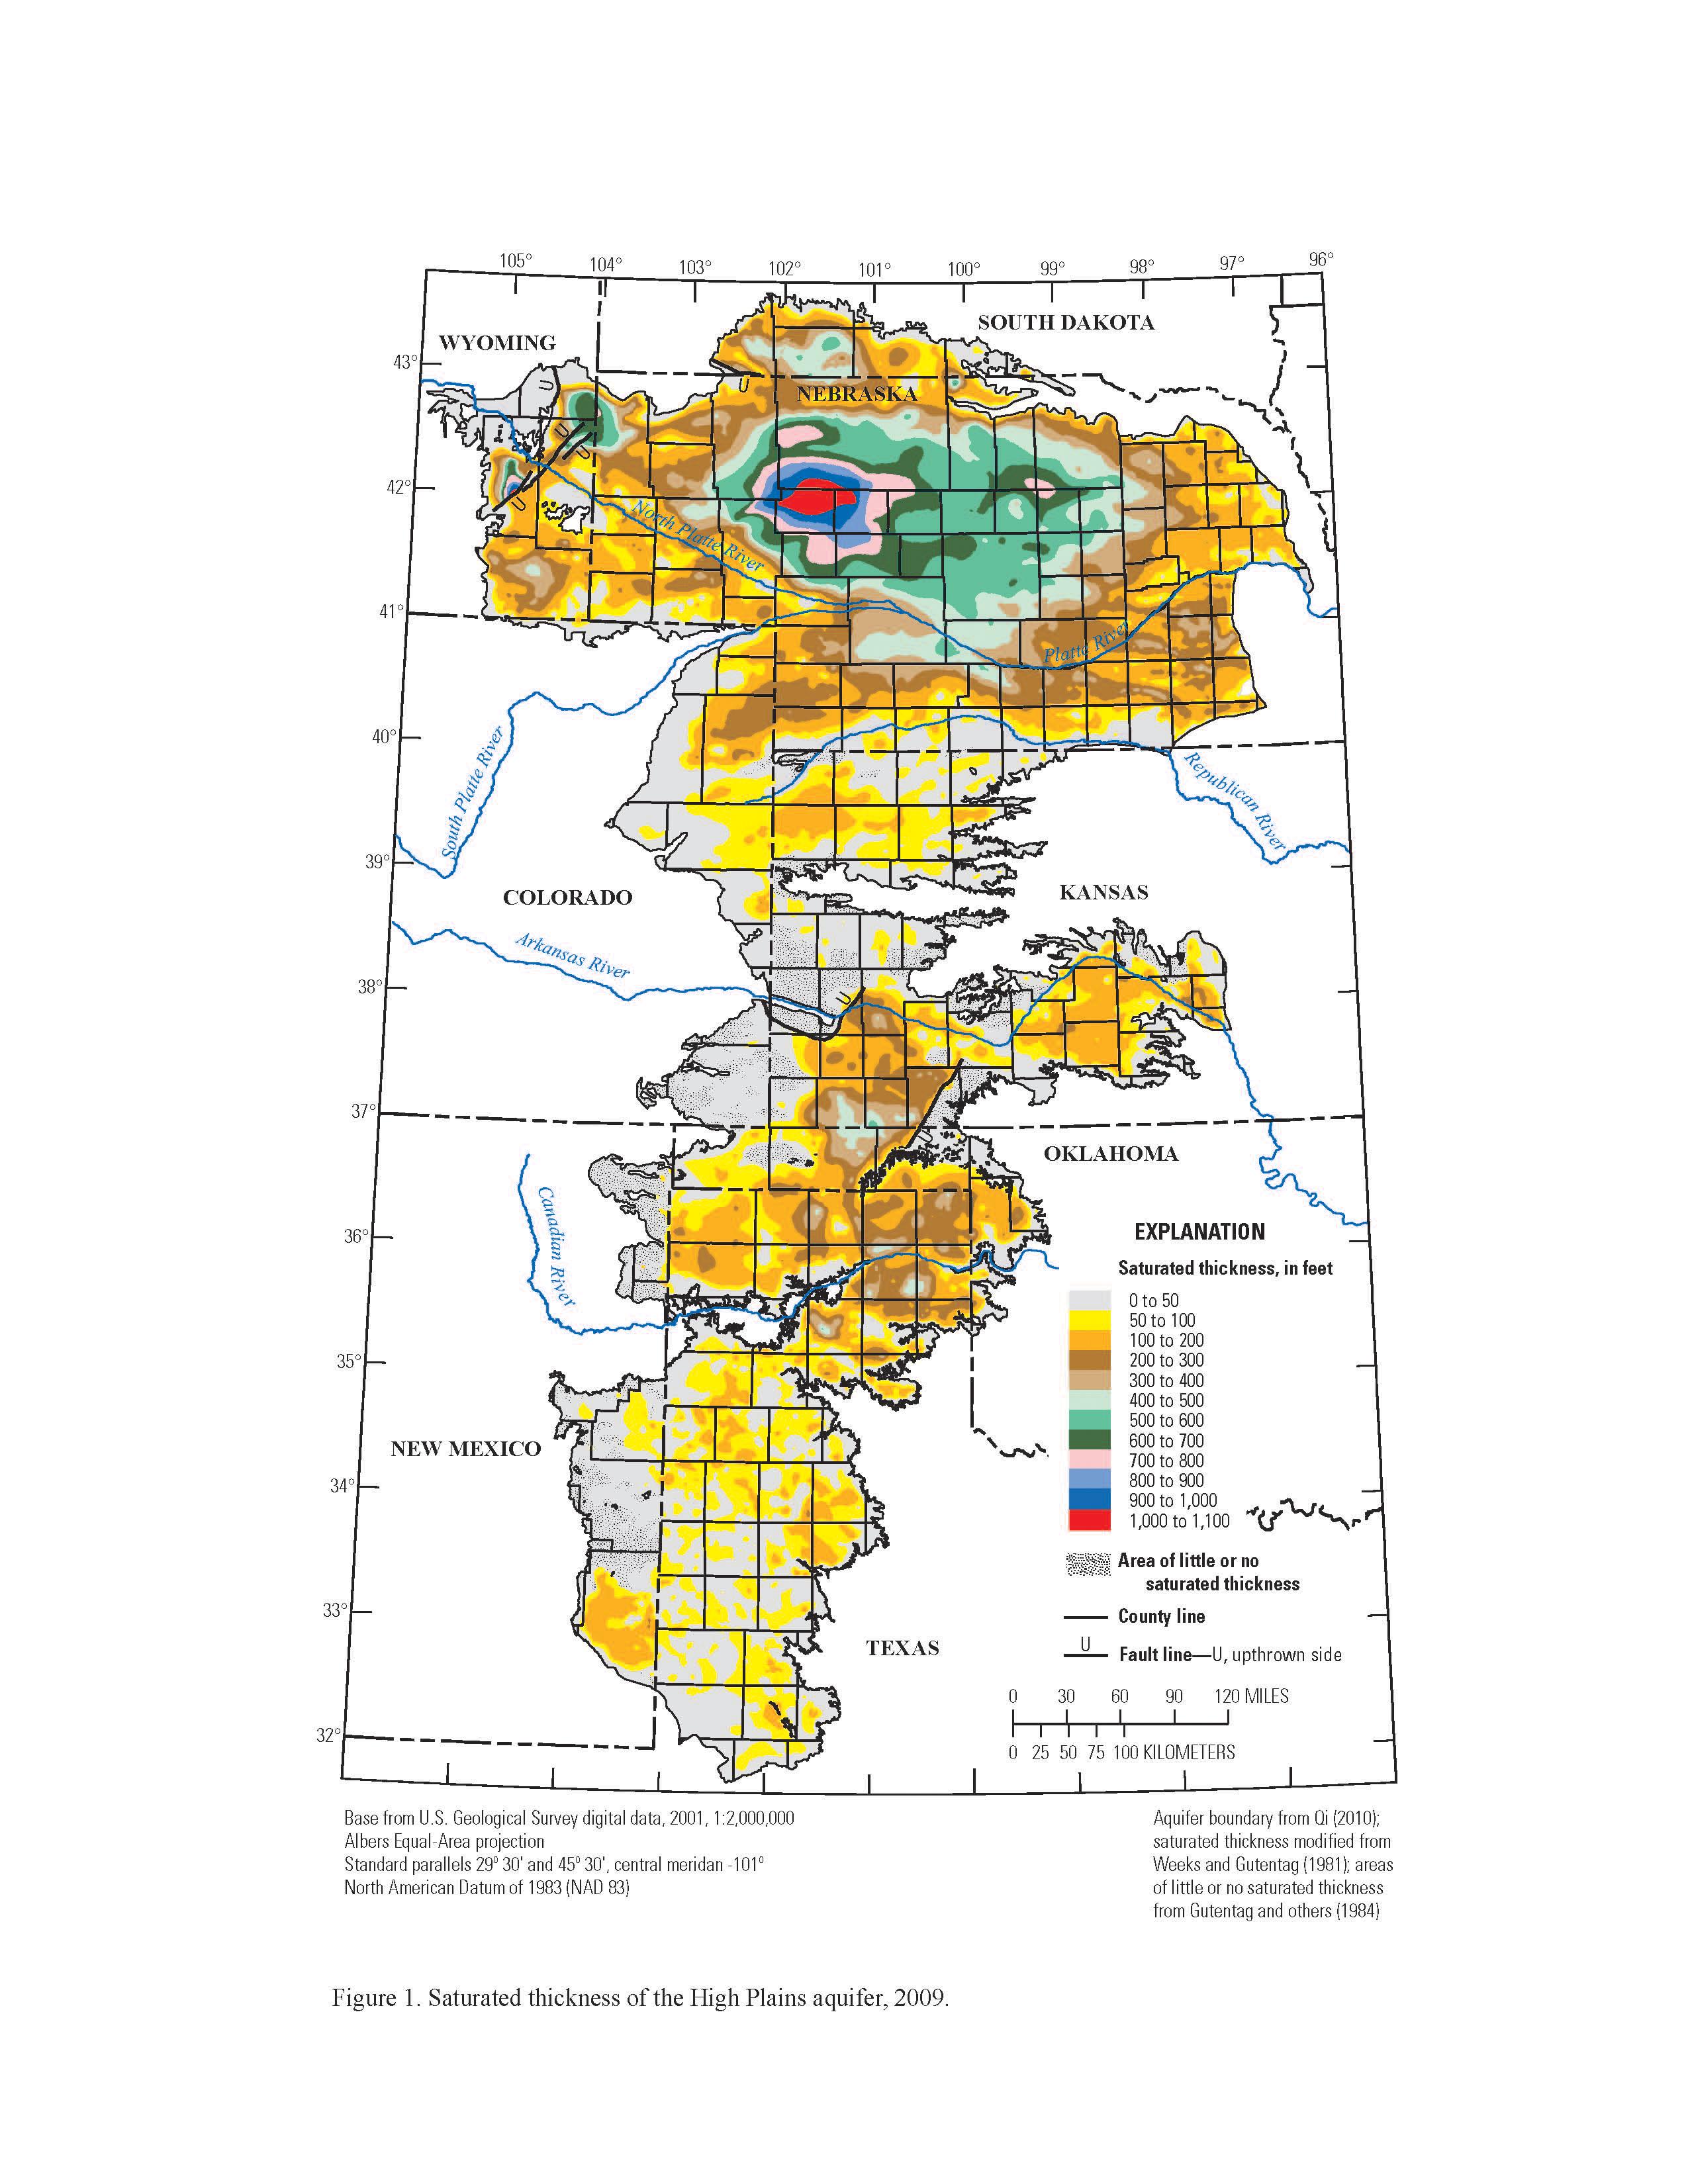 Saturated thickness, High Plains aquifer, 2009 - Data.gov